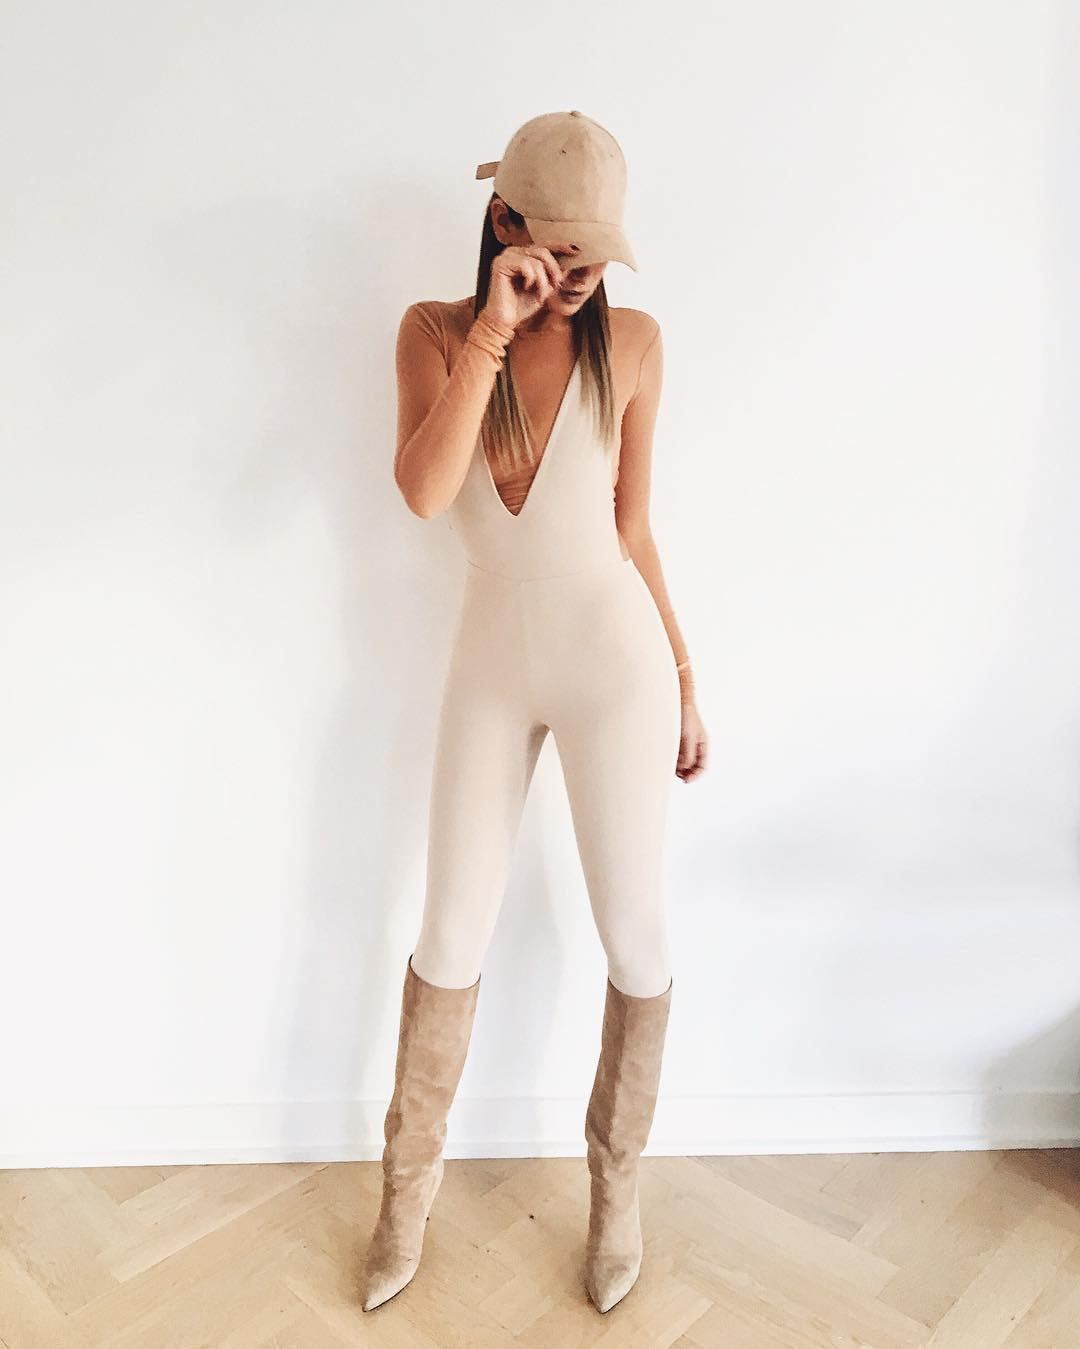 Hacked Carlota Ensenat nudes (98 foto and video), Tits, Sideboobs, Twitter, cleavage 2019